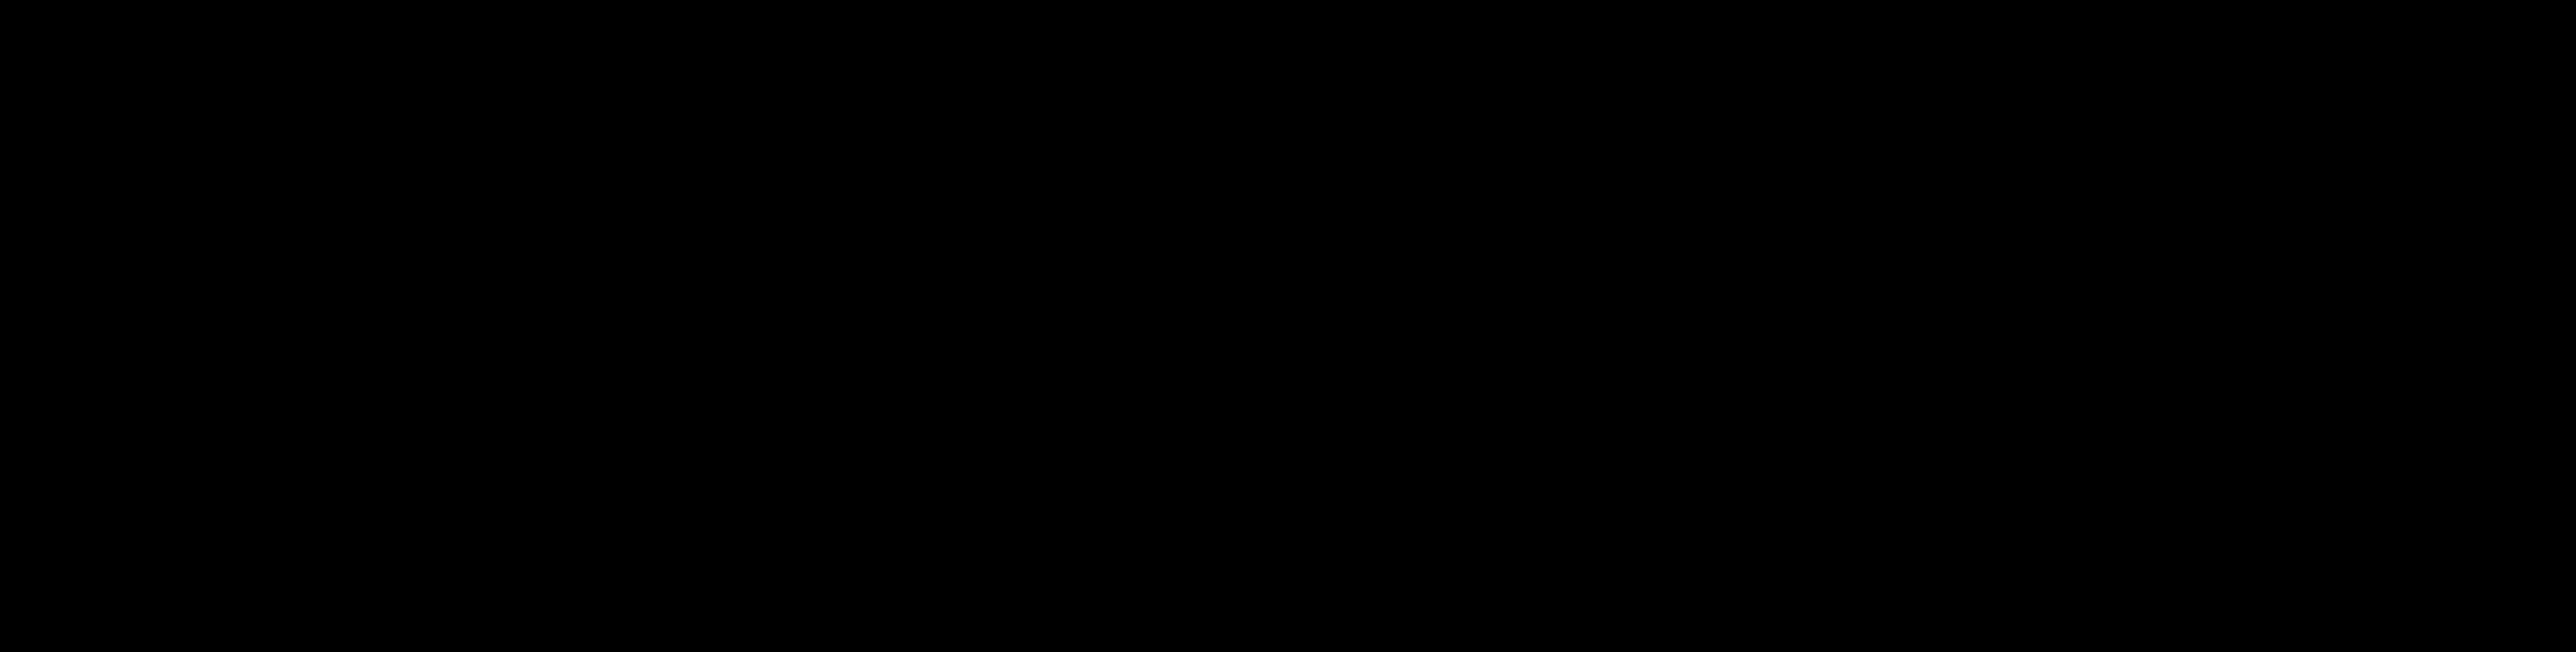 N-[6-(Biotinamido)hexanoyl]-N